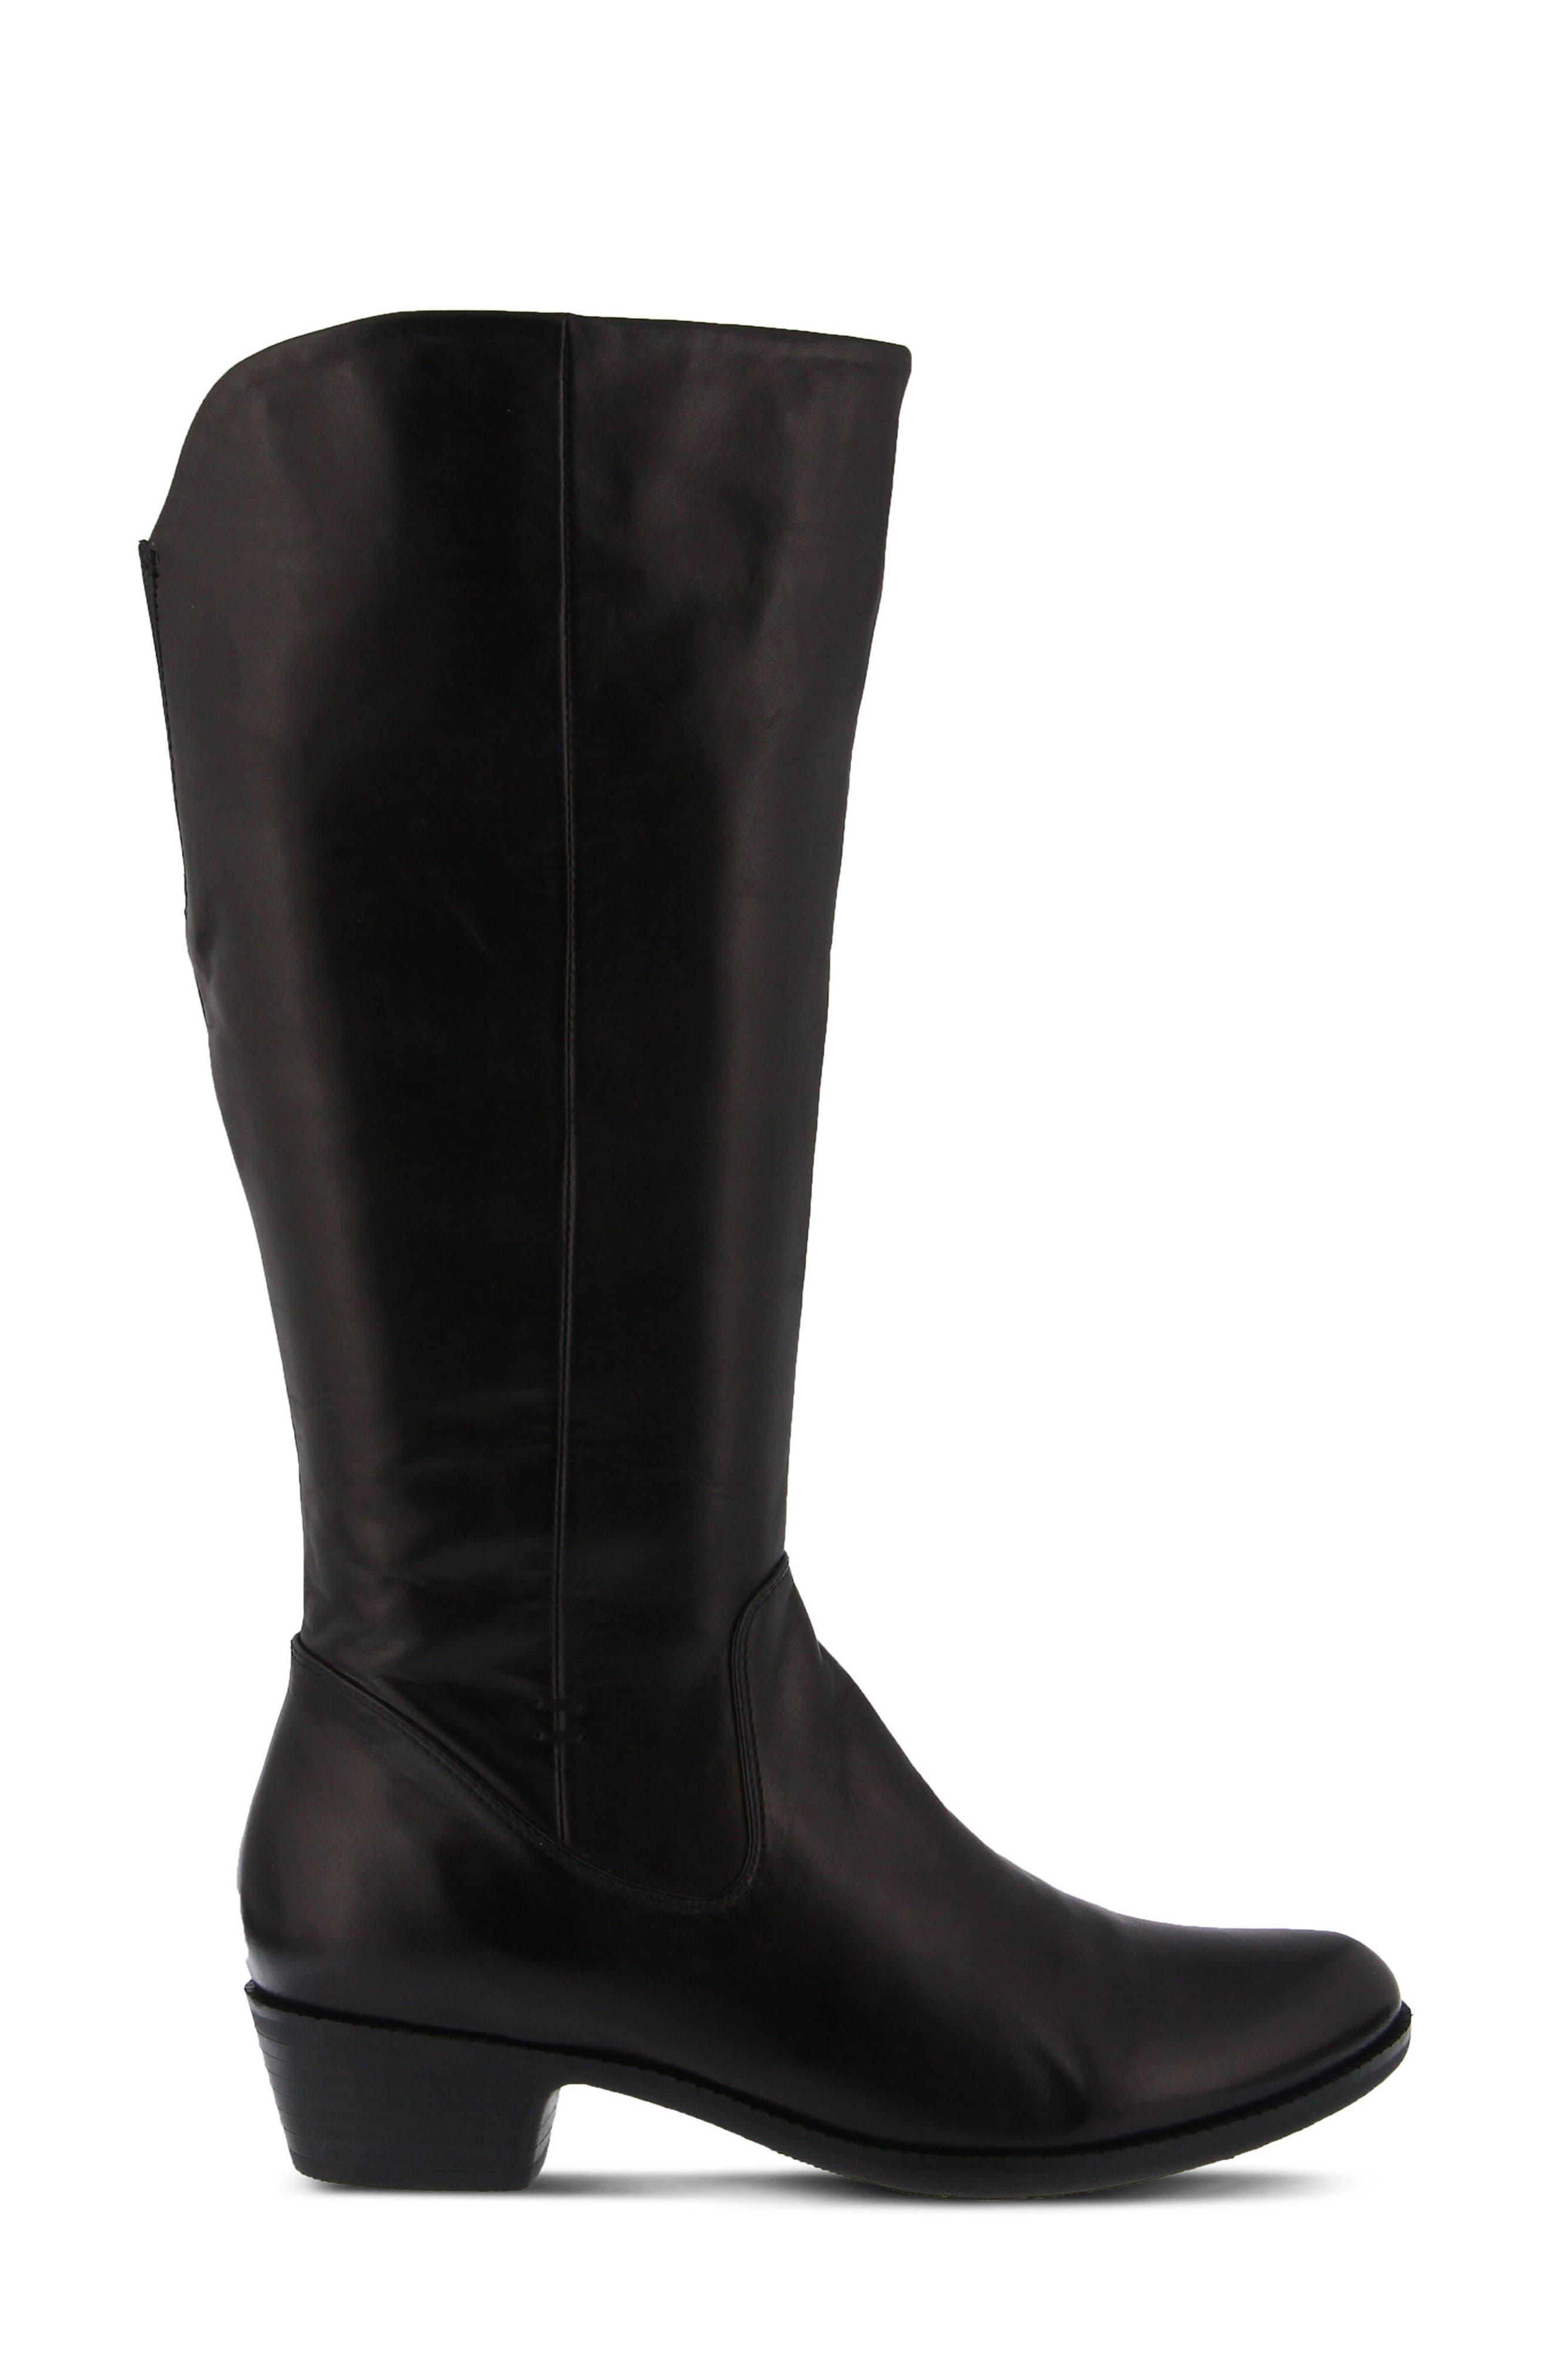 Bolah Tall Boot,                             Alternate thumbnail 3, color,                             Black Leather